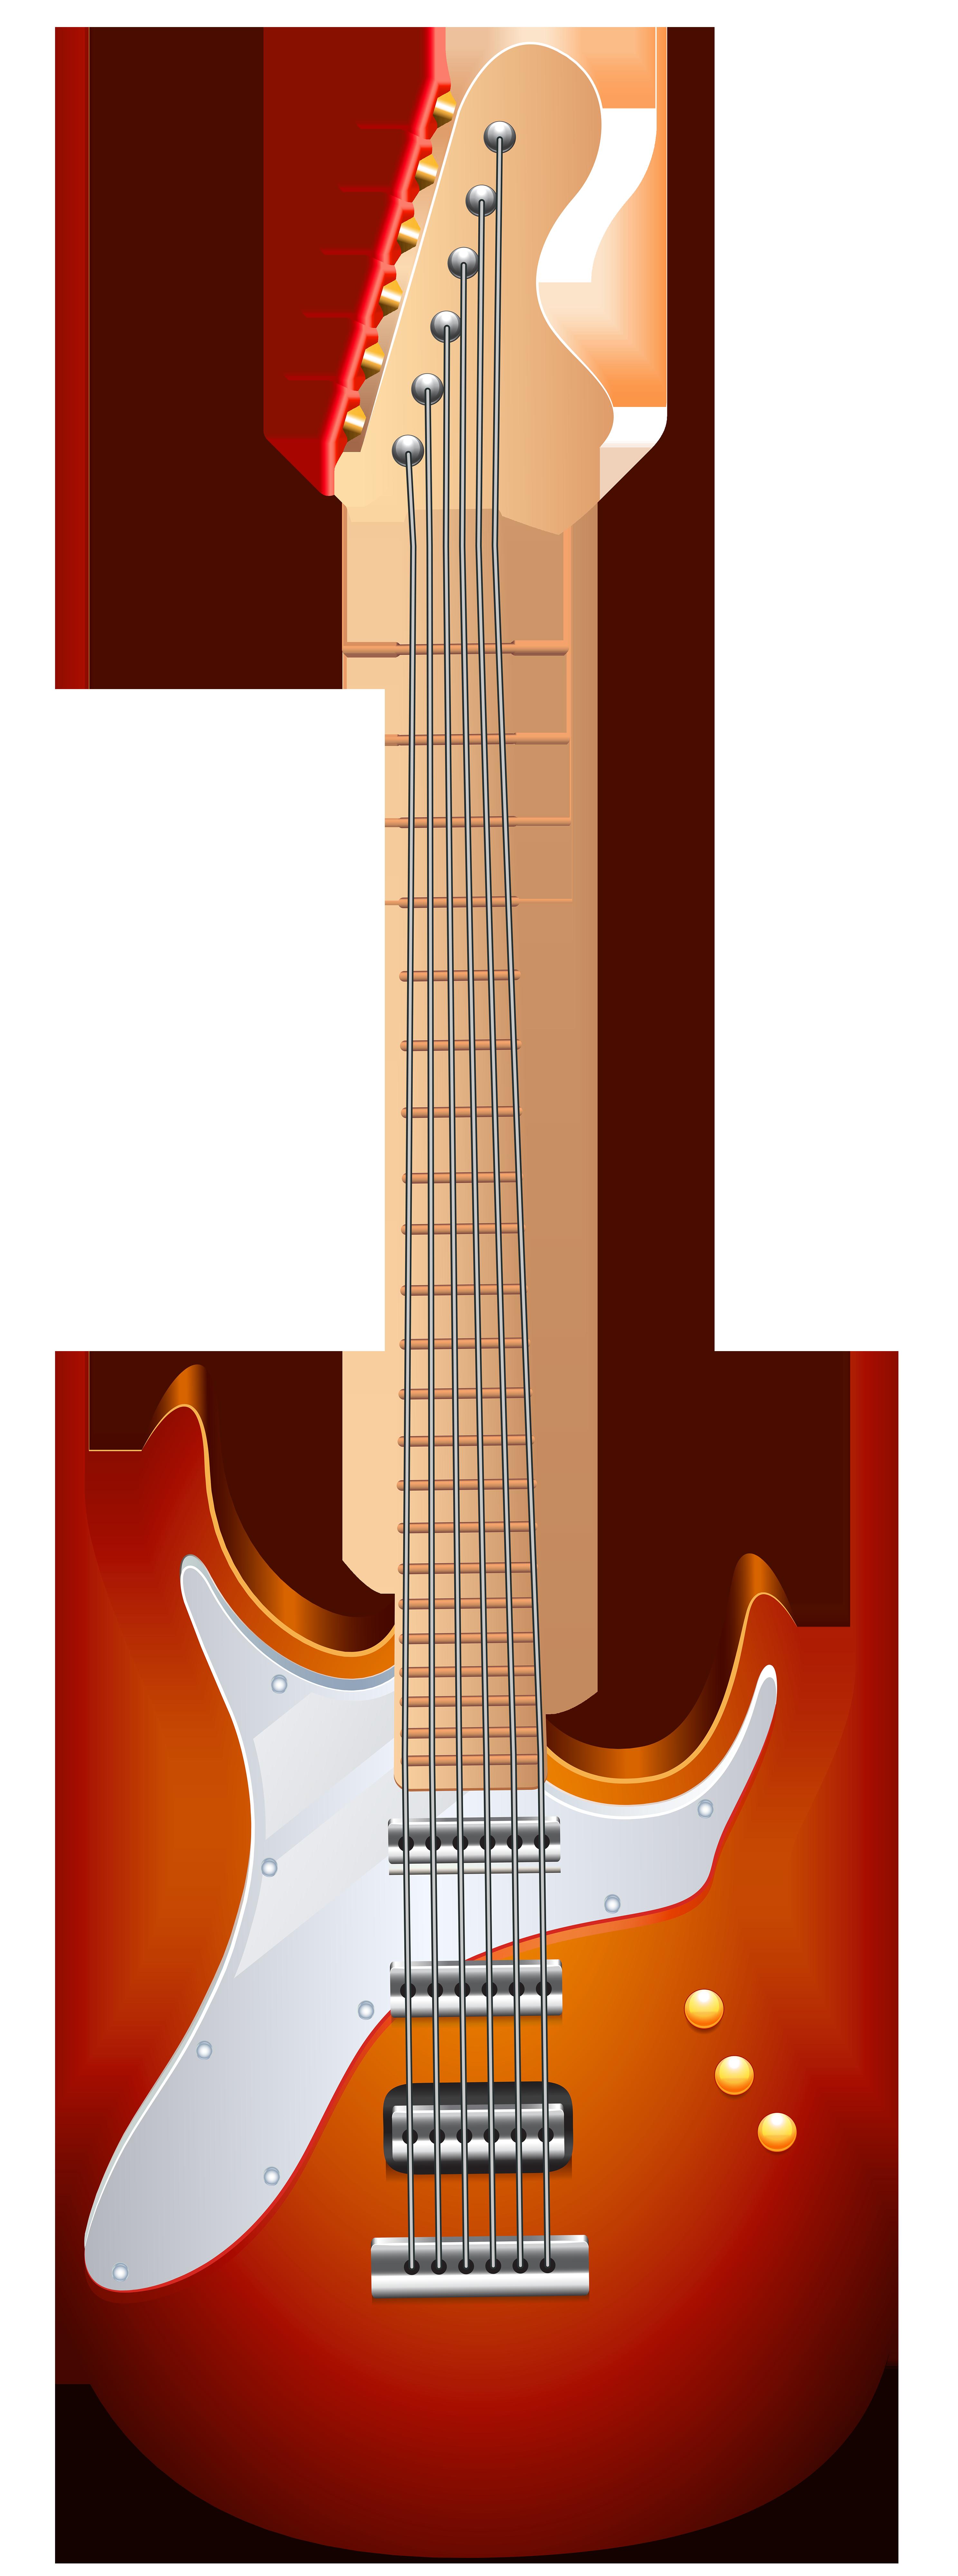 Clipart guitar transparent background, Clipart guitar ...